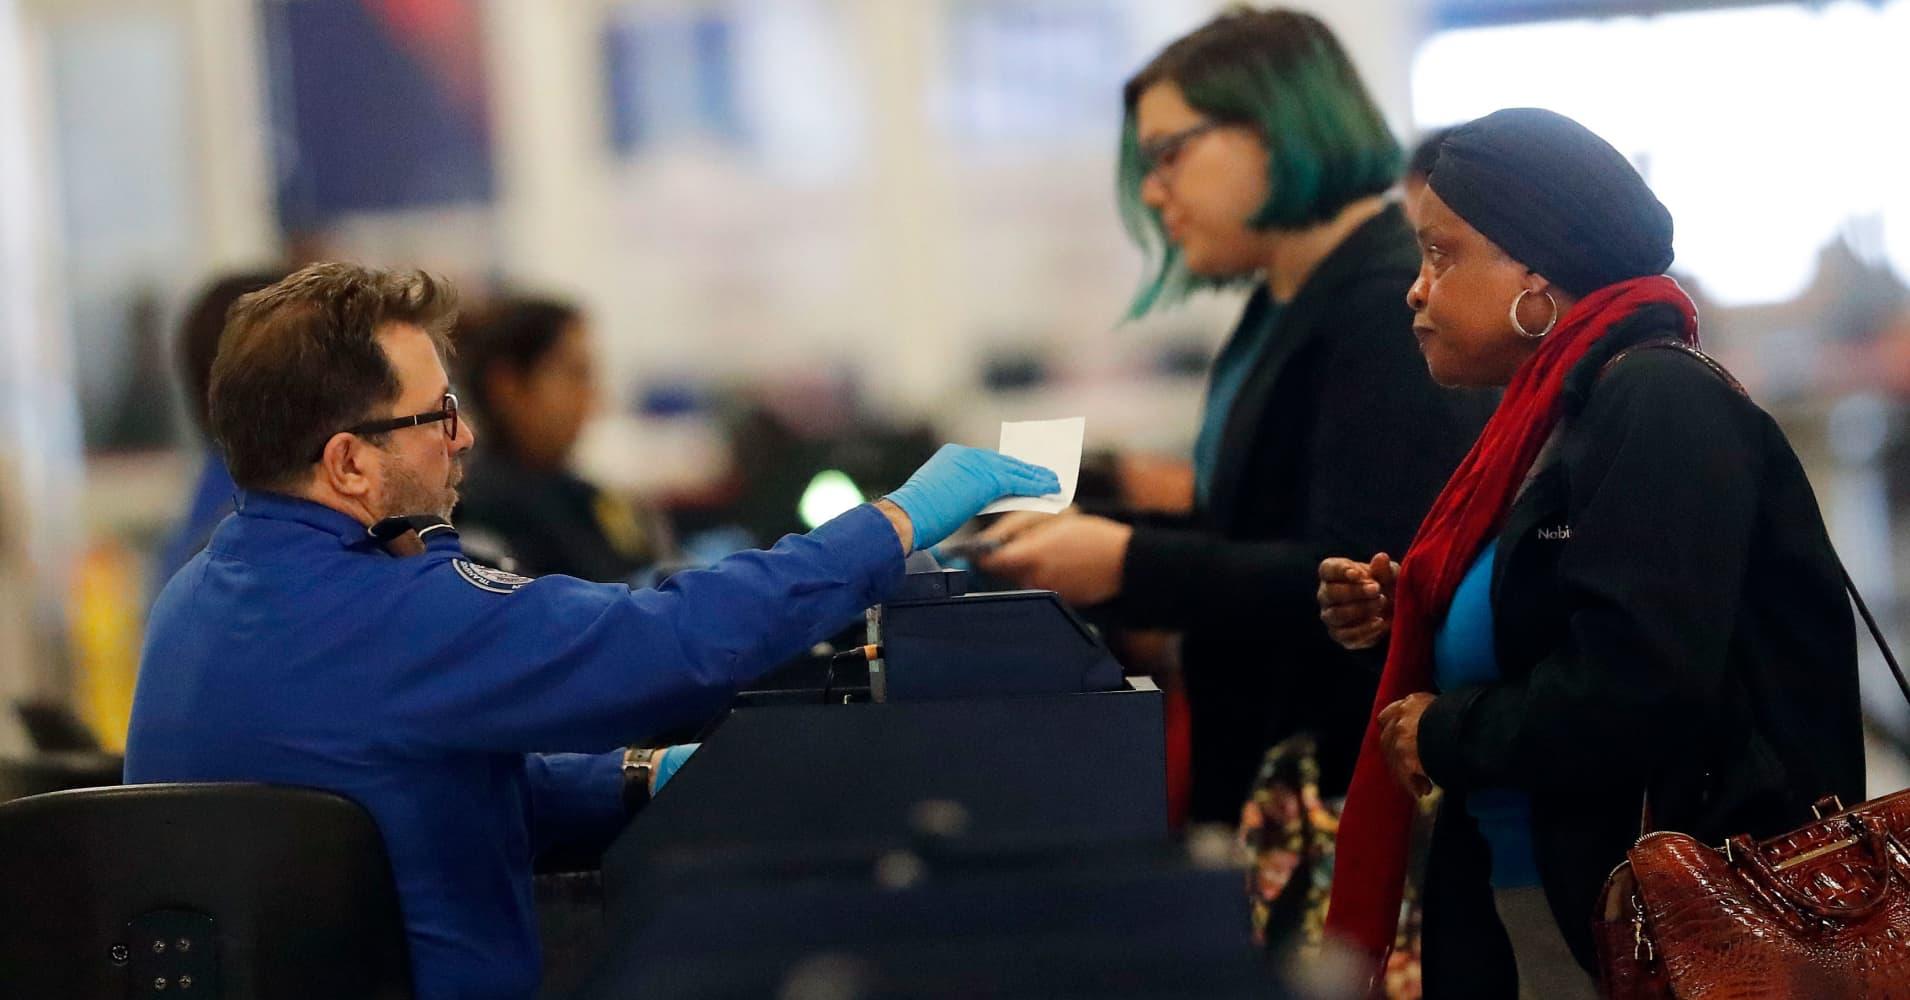 Passengers face long lines, closed checkpoints as unpaid TSA screeners call in sick amid shutdown